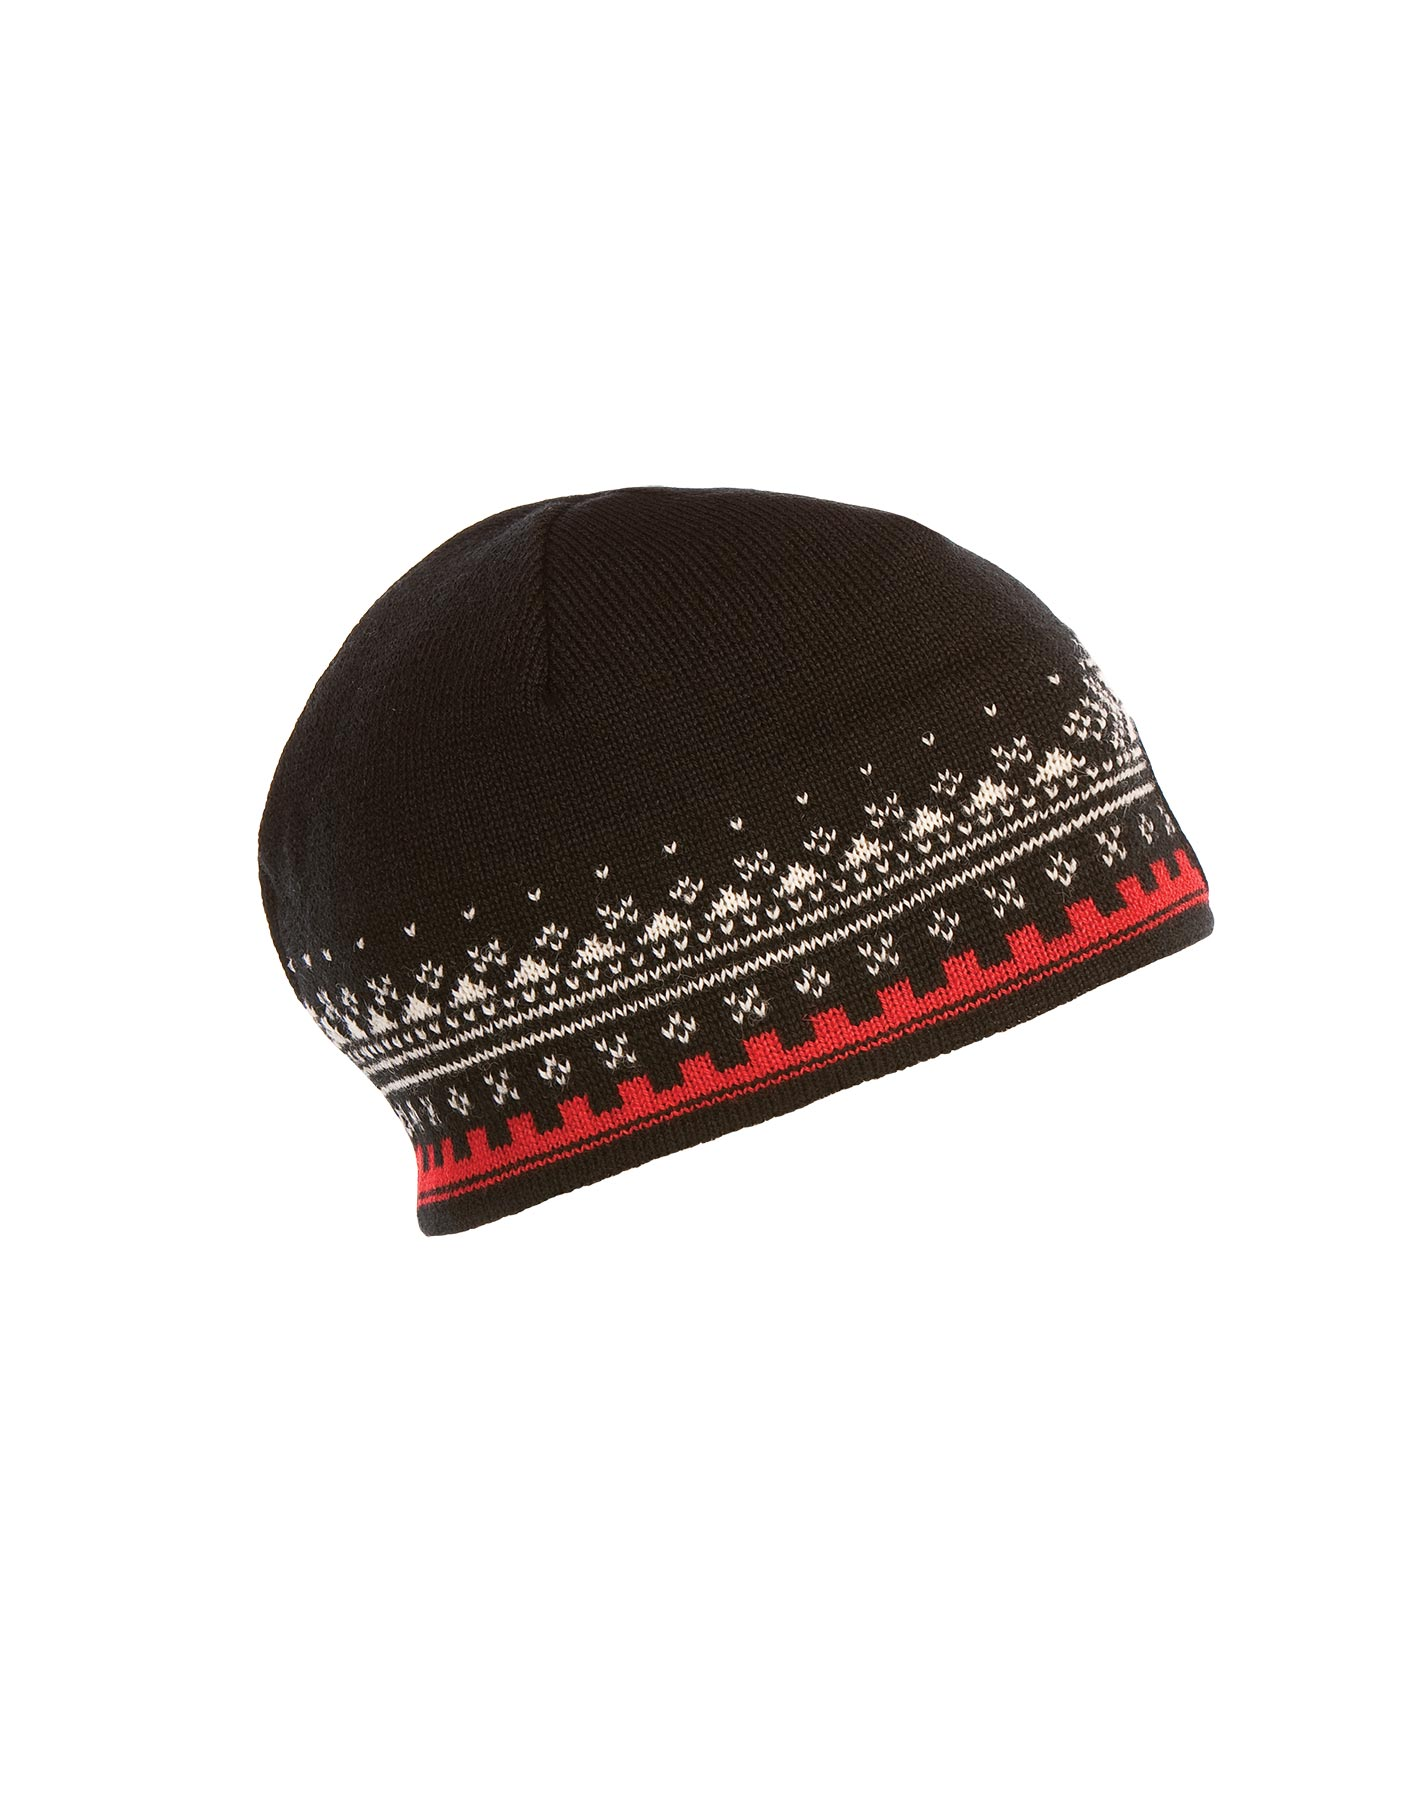 125th Anniversary Hat